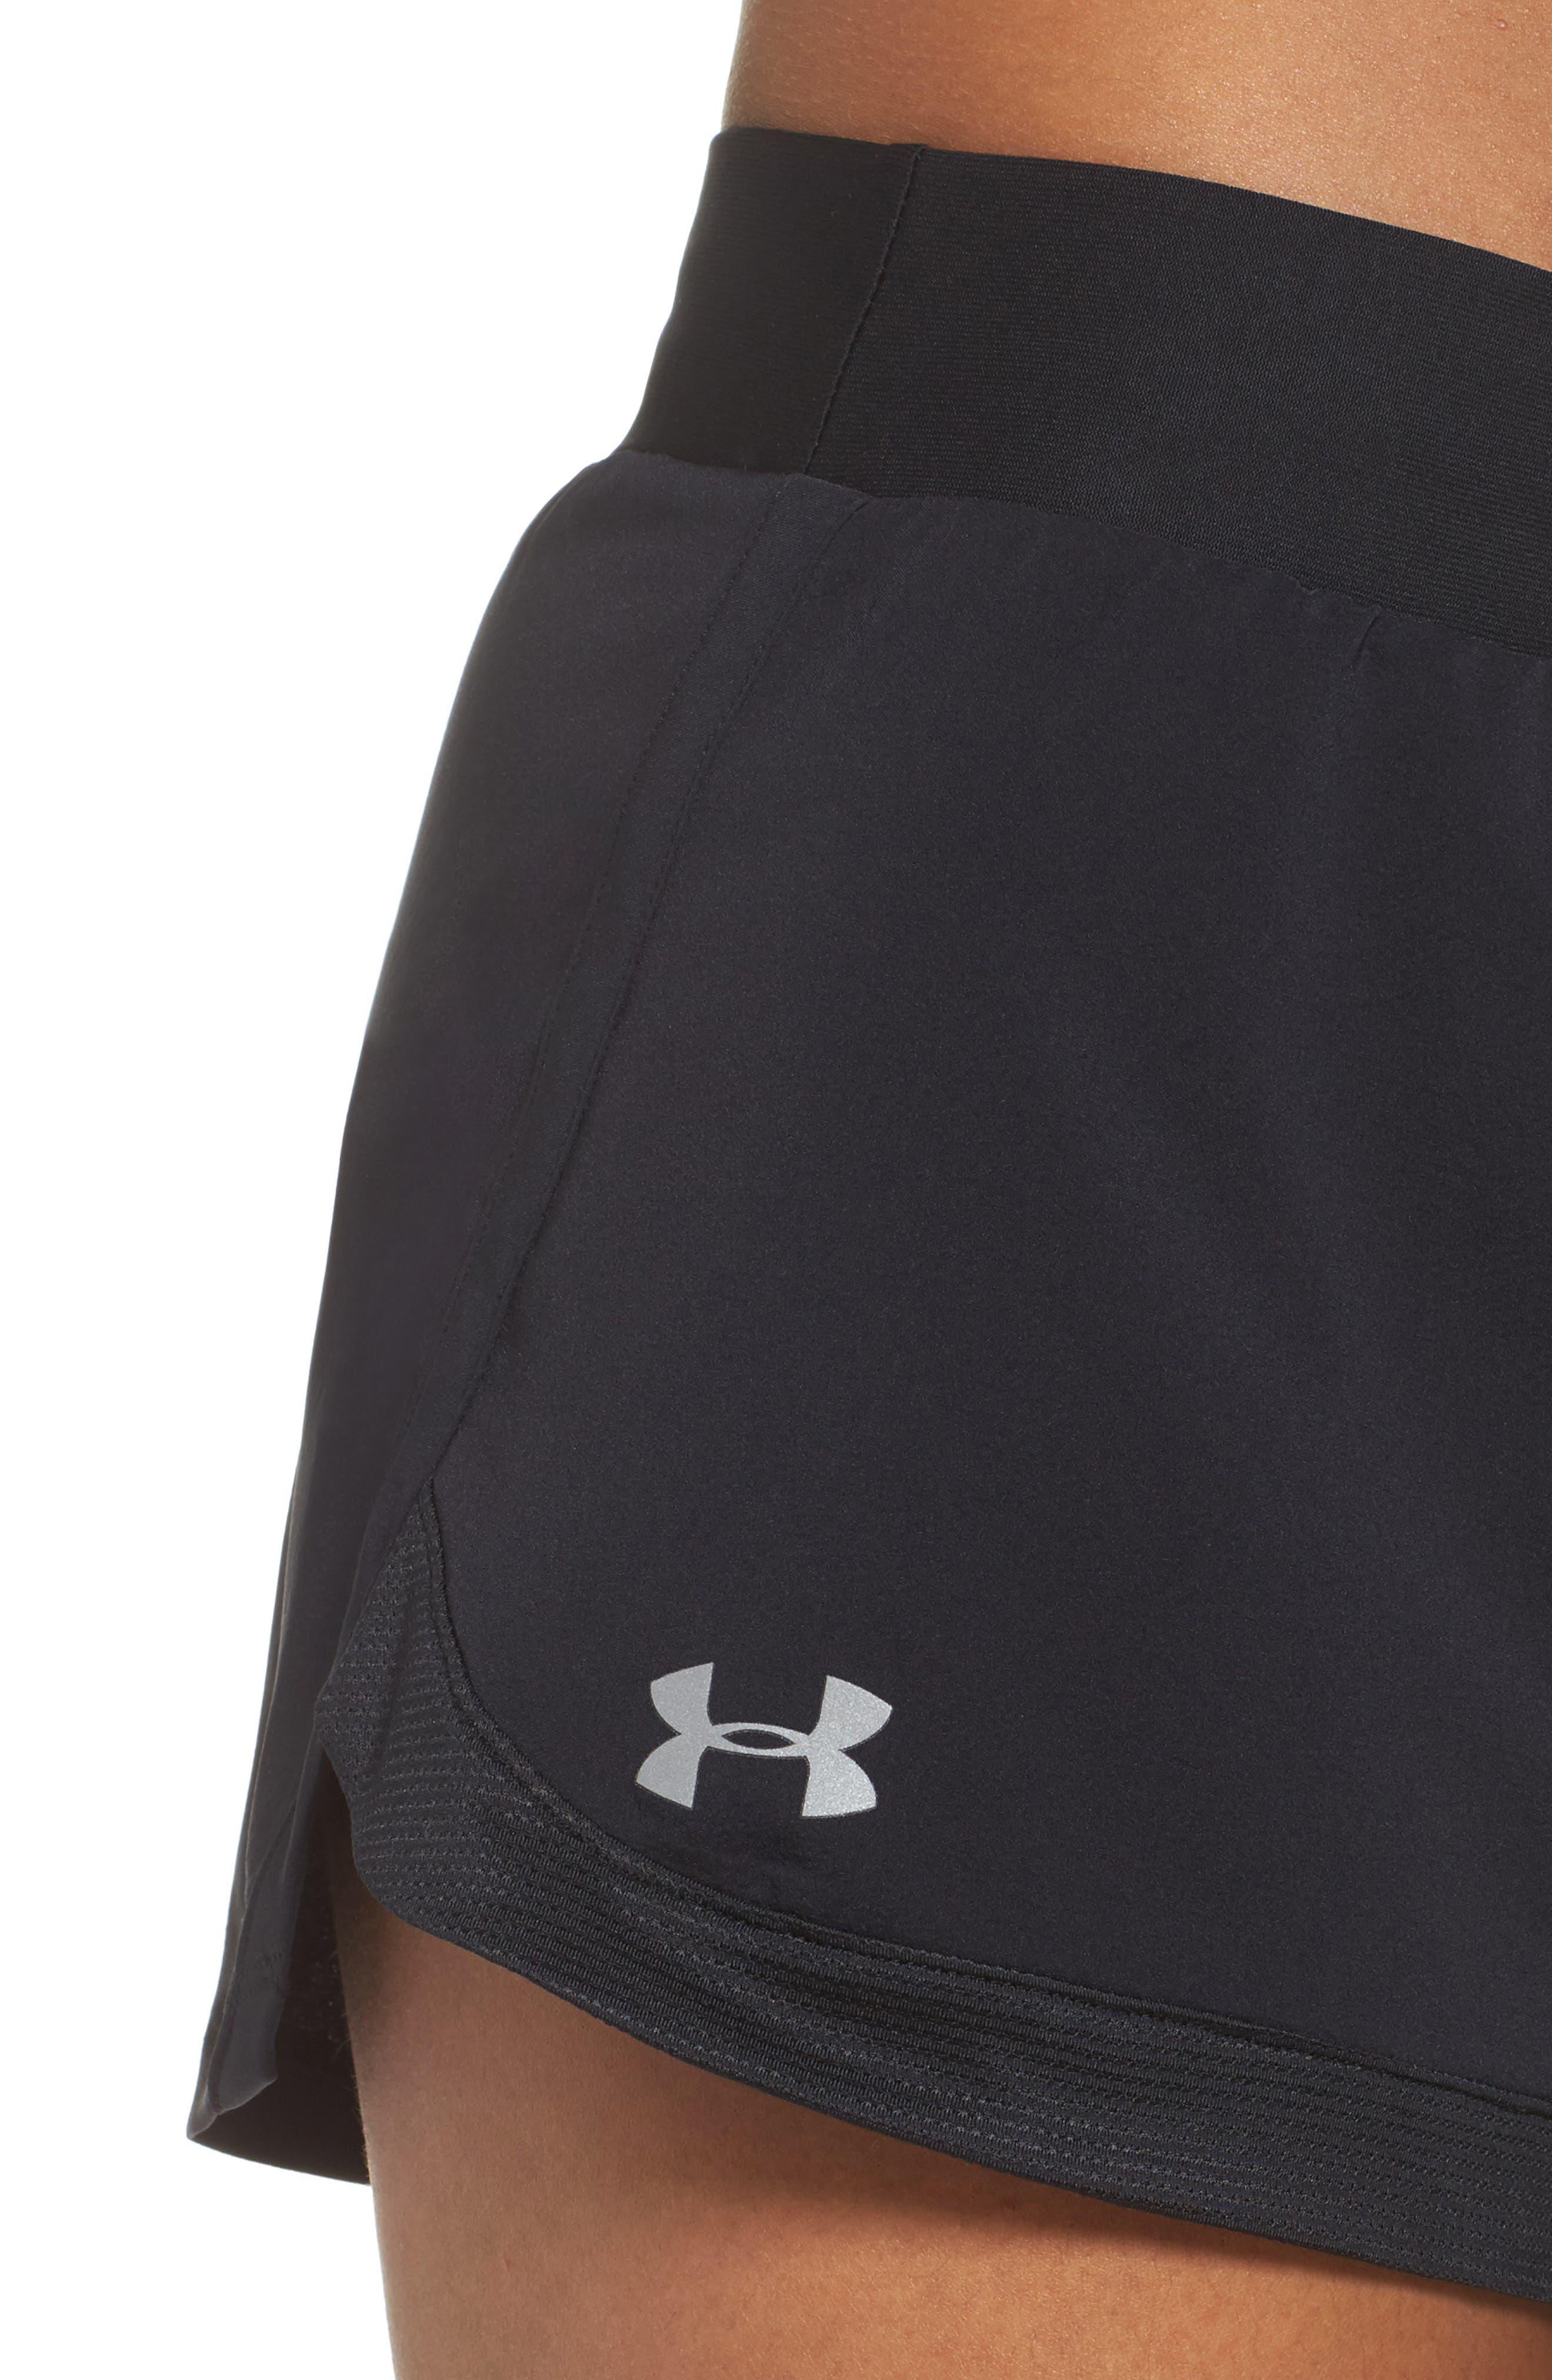 Speedpocket Shorts,                             Alternate thumbnail 4, color,                             001